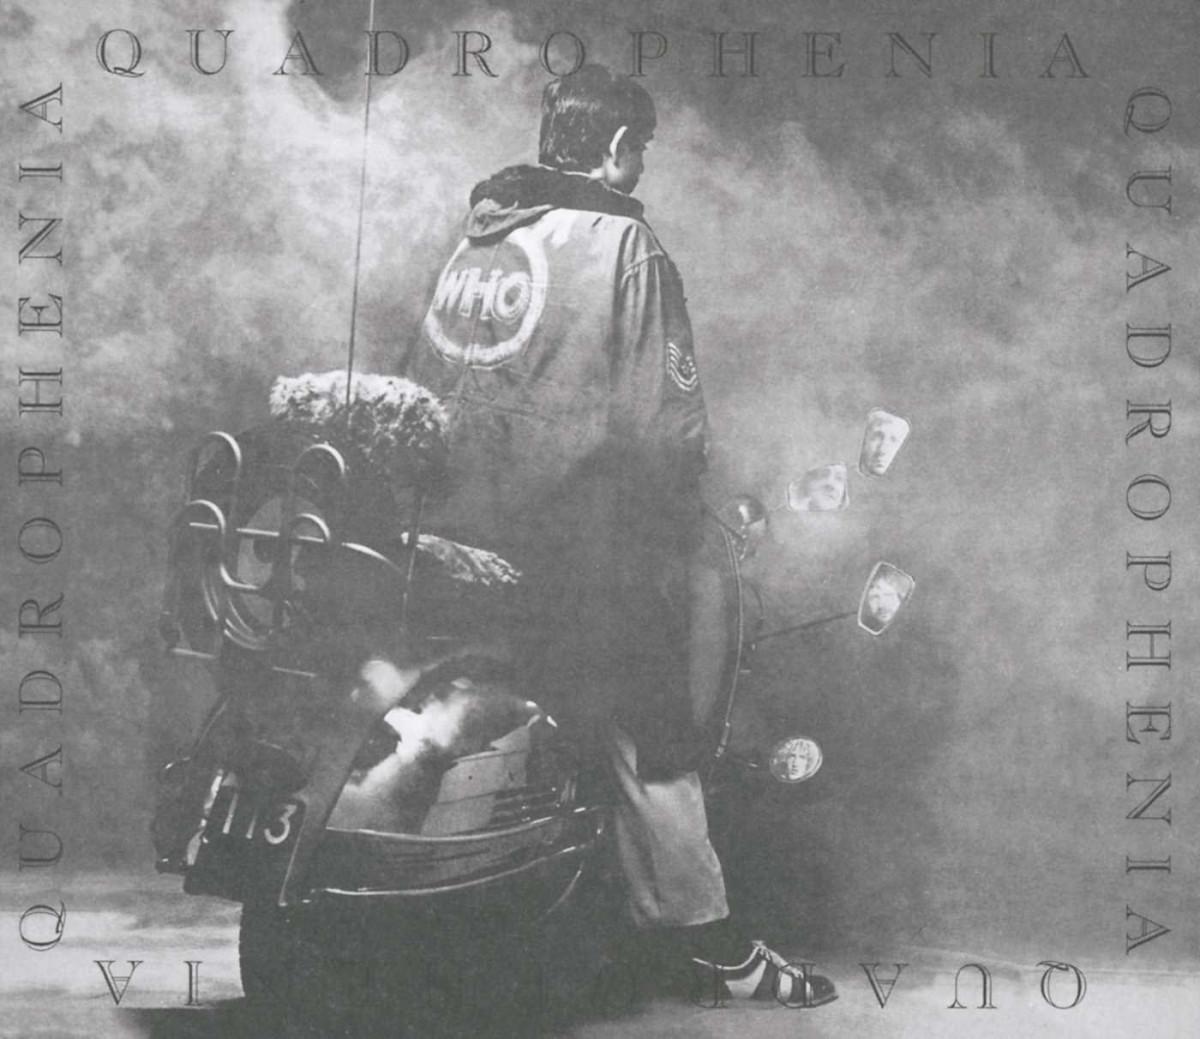 The Who, Quadrophenia